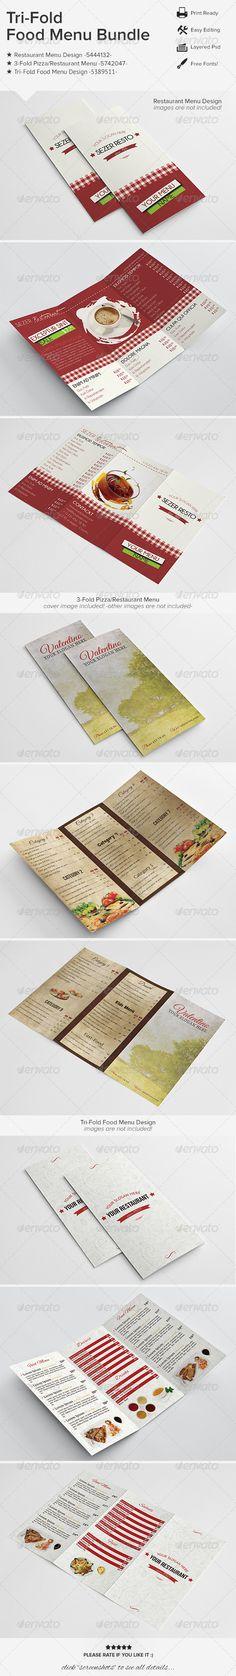 TriFold Restaurant Food Menu Template  Food Menu Template Menu